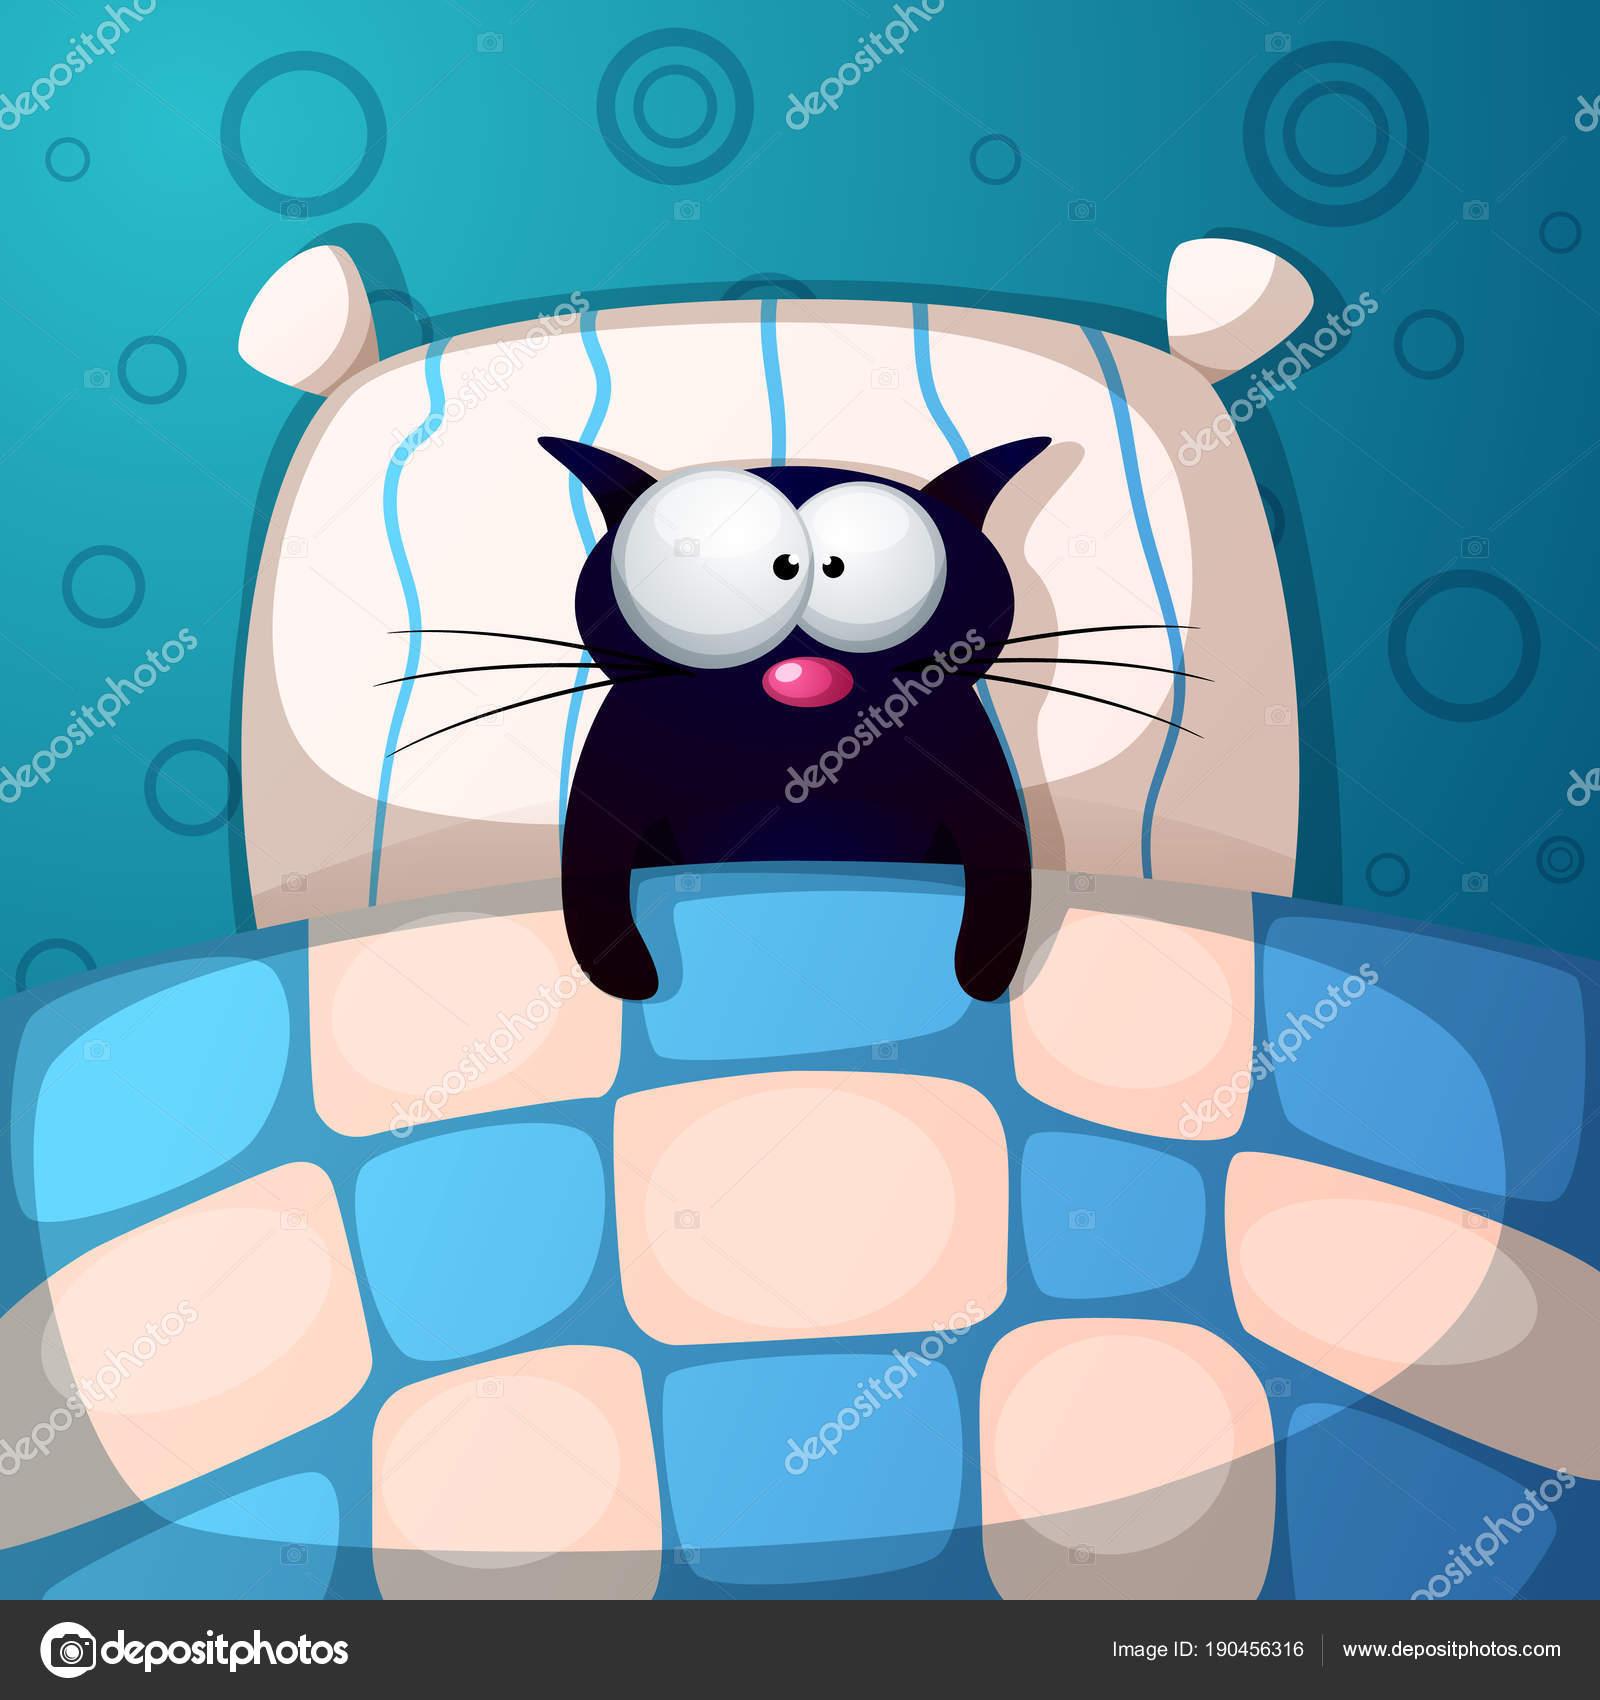 Comic Katze Schlafen Abbildung Zimmer Bett Kissen Stockvektor